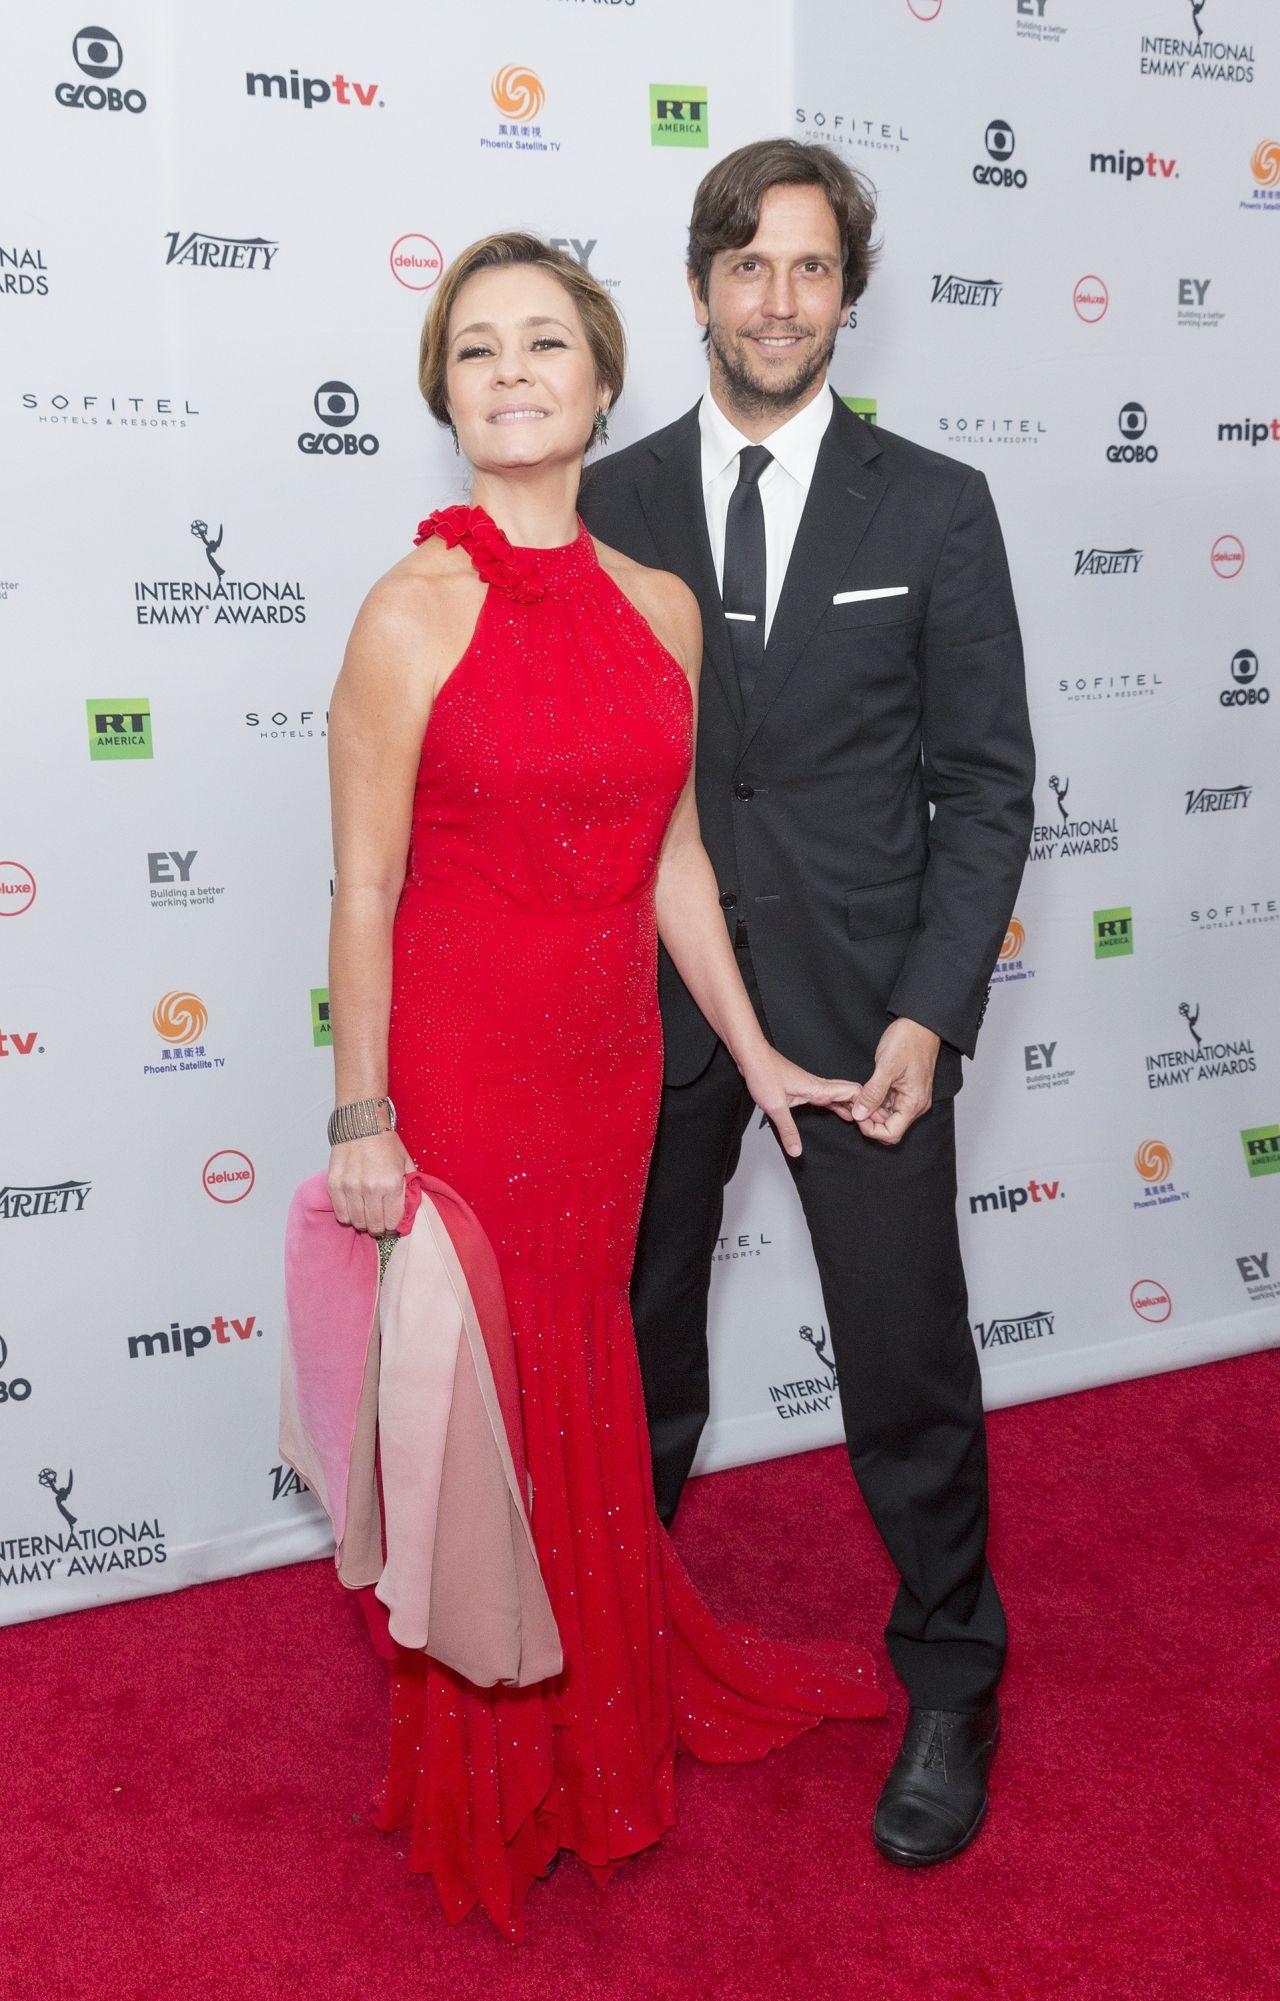 http://celebmafia.com/wp-content/uploads/2017/11/adriana-esteves-international-emmy-awards-2017-in-new-york-0.jpg